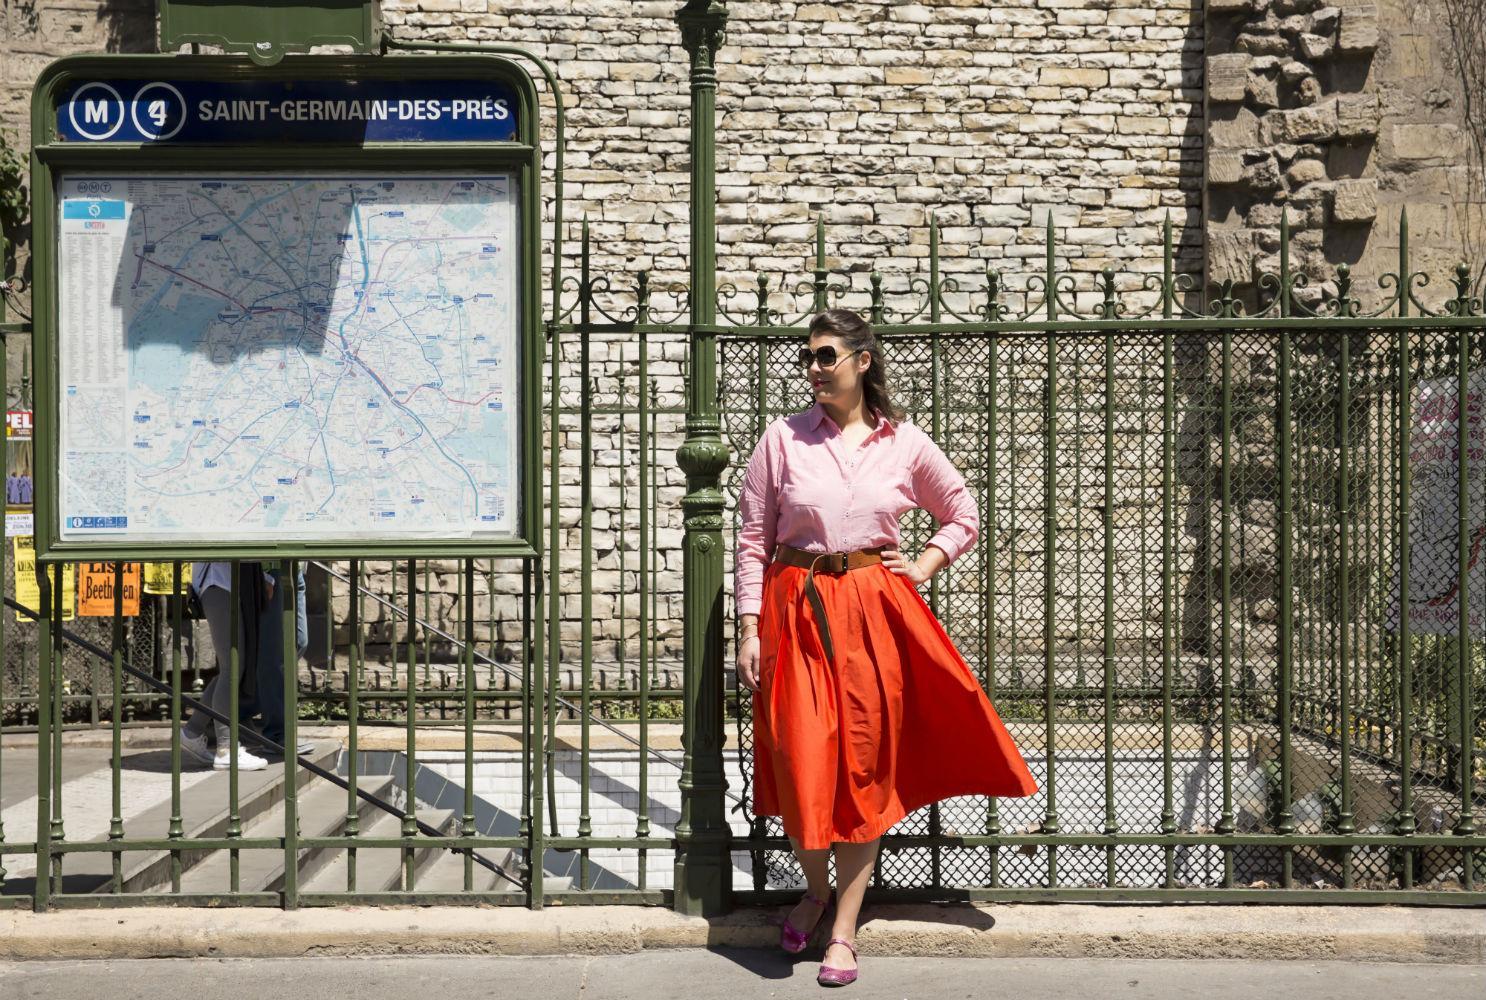 Dalani, Cosa vedere a Parigi, City Tour, Style, Parigi, Fashion, Arte